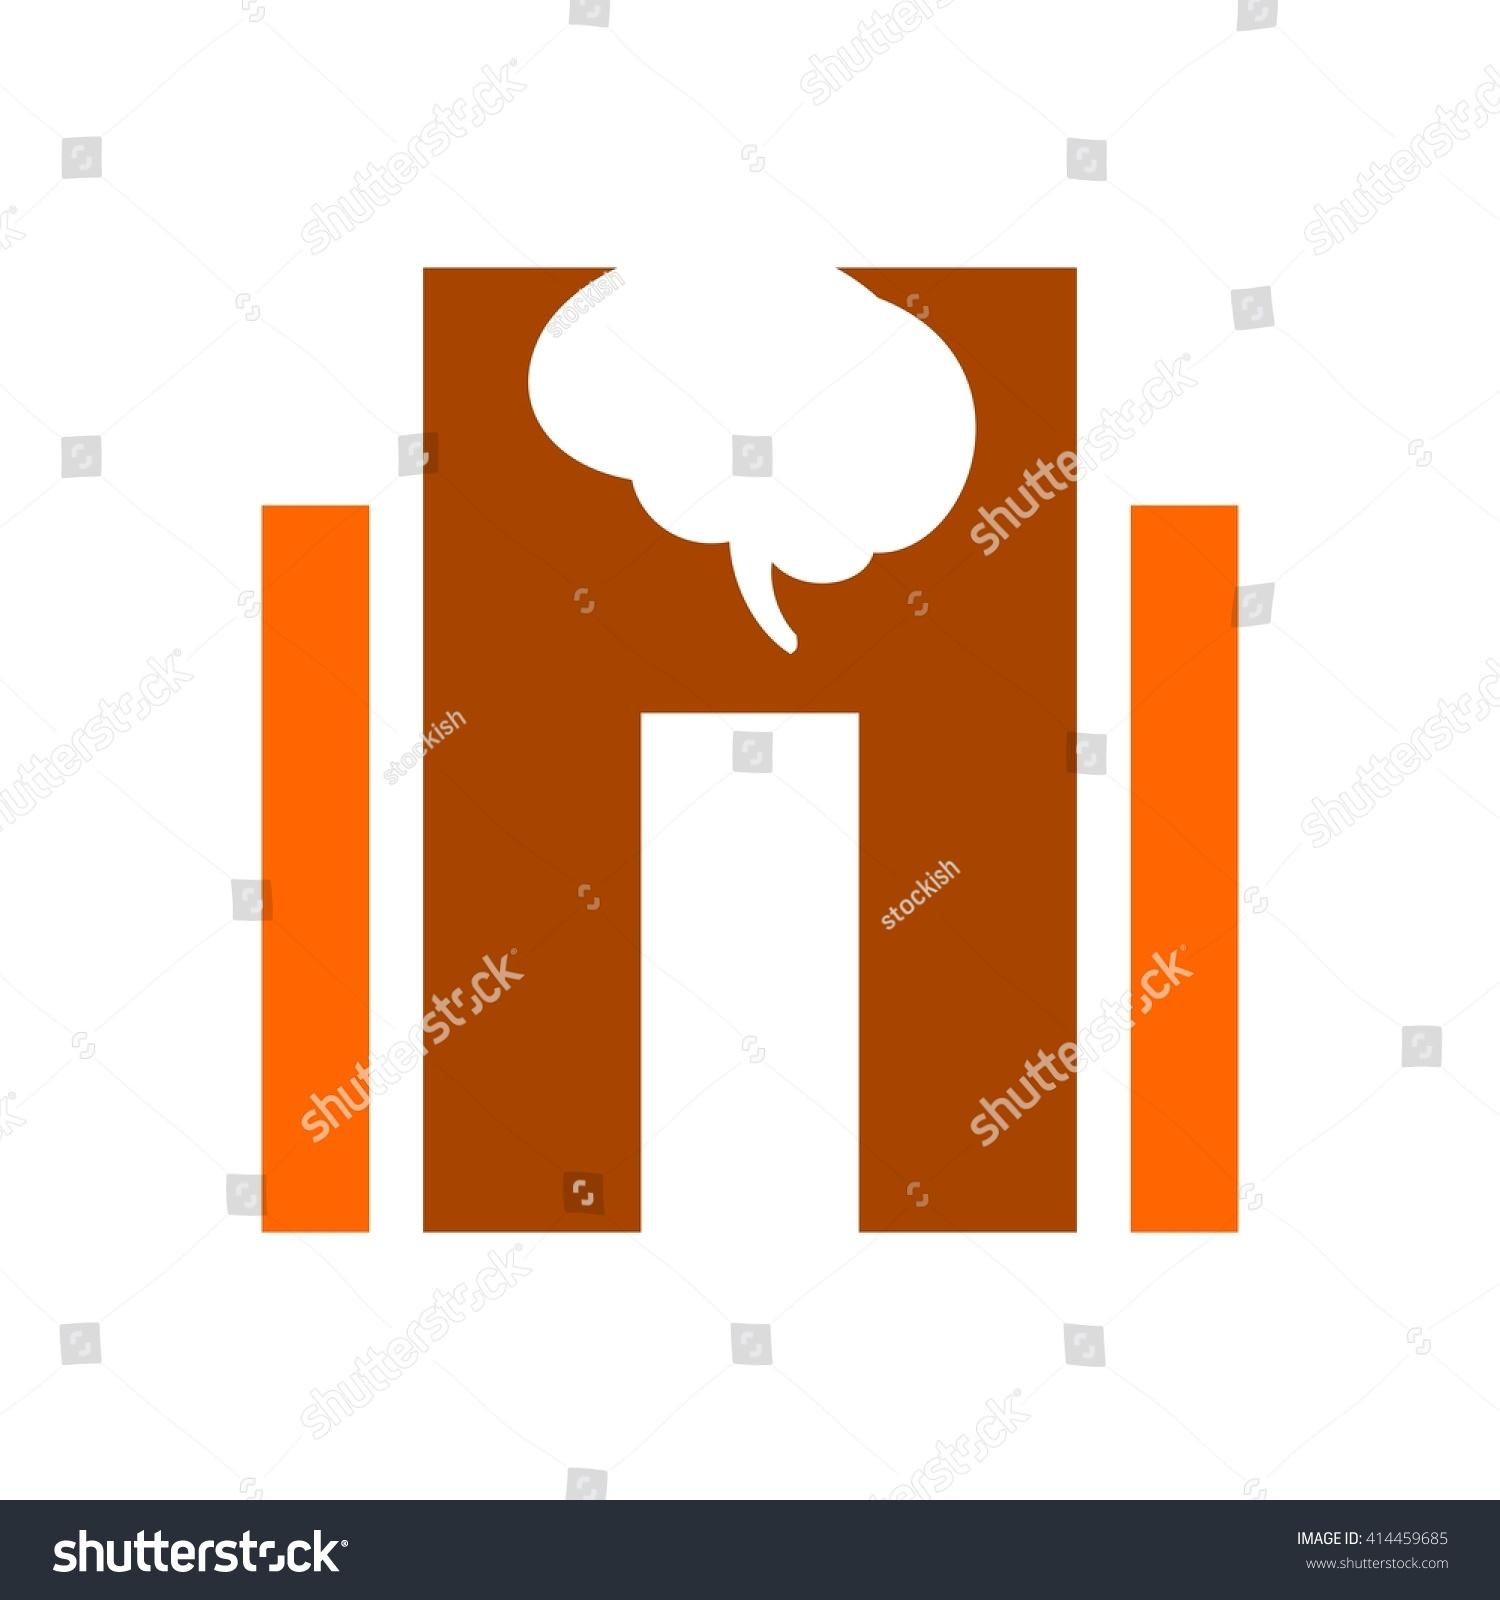 Letter h brain symbol logo vector stock vector 414459685 shutterstock letter h and brain symbol logo vector biocorpaavc Images